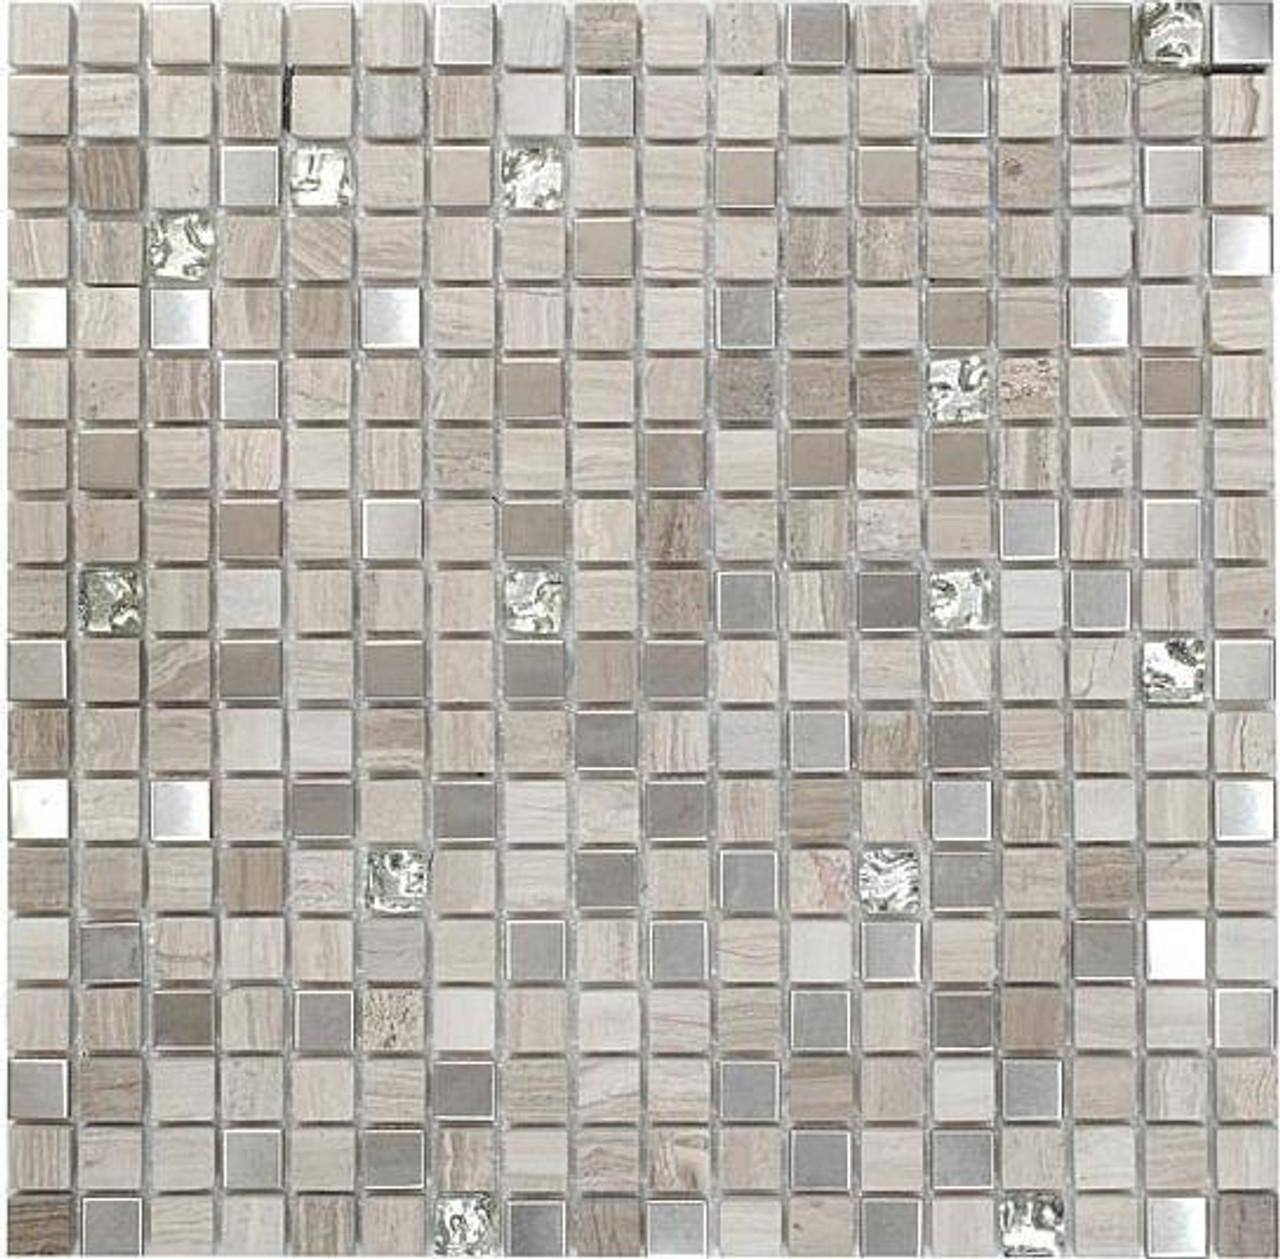 Bella Glass Tiles Opulence 5/8 x 5/8 Mosaic Series White Sand